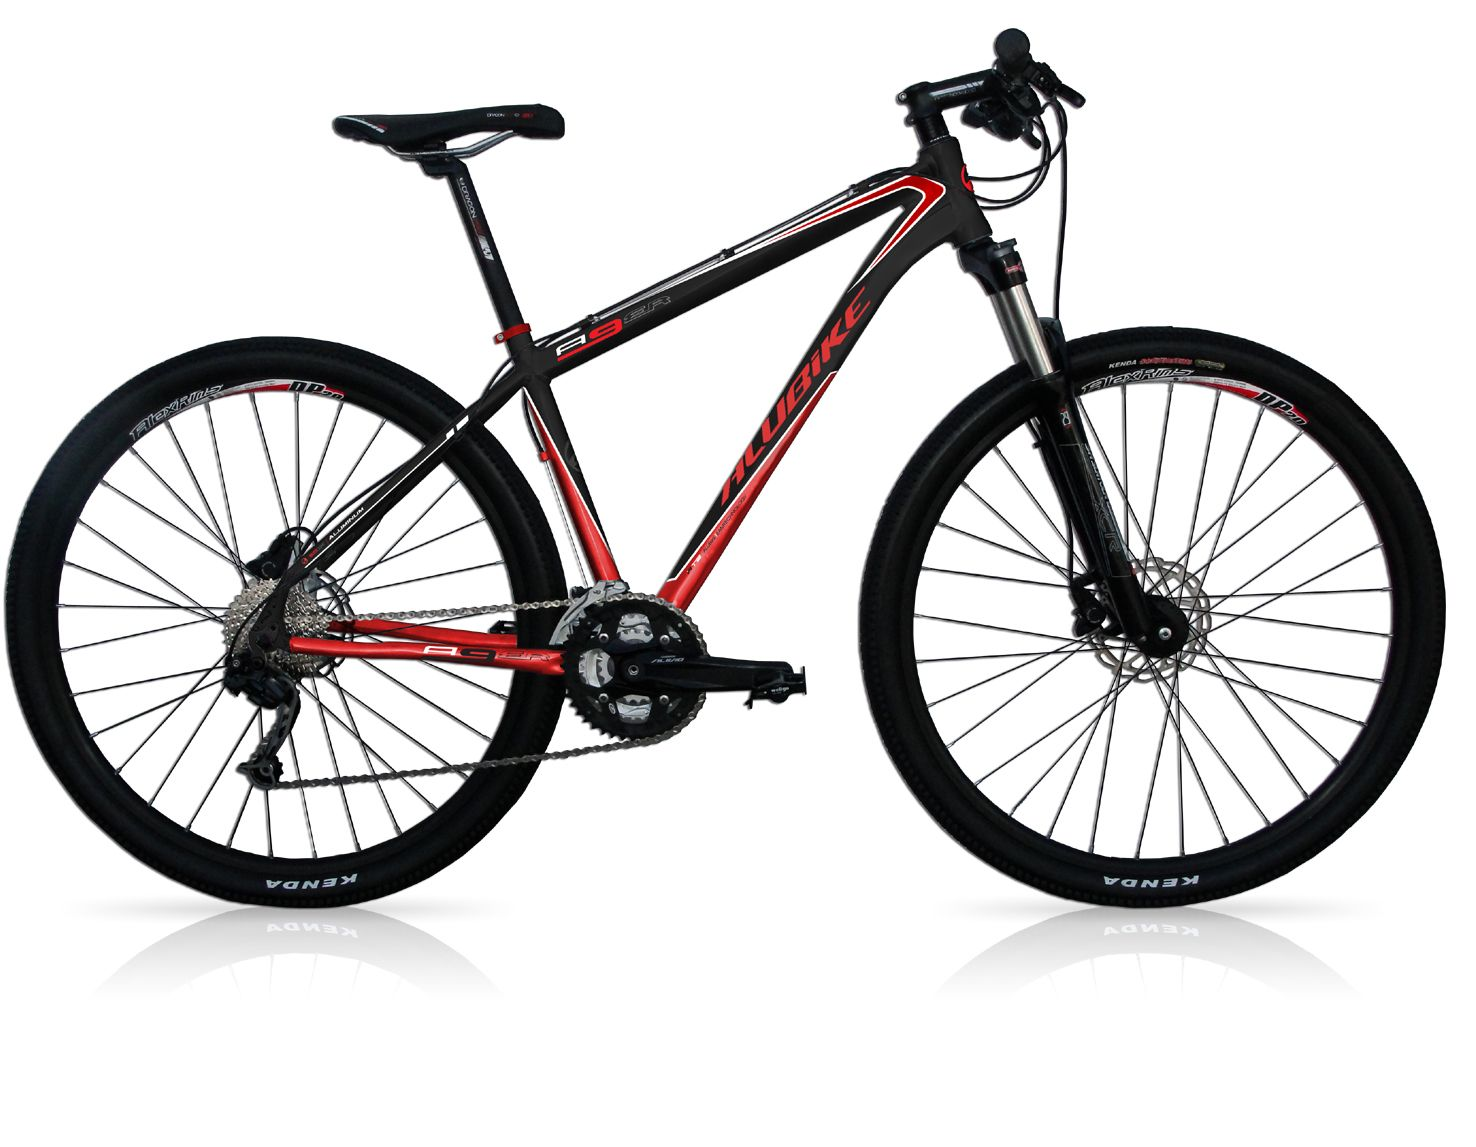 Alubike A9ER Bicicleta MTB https://www.facebook.com/Alubike | BTT ...